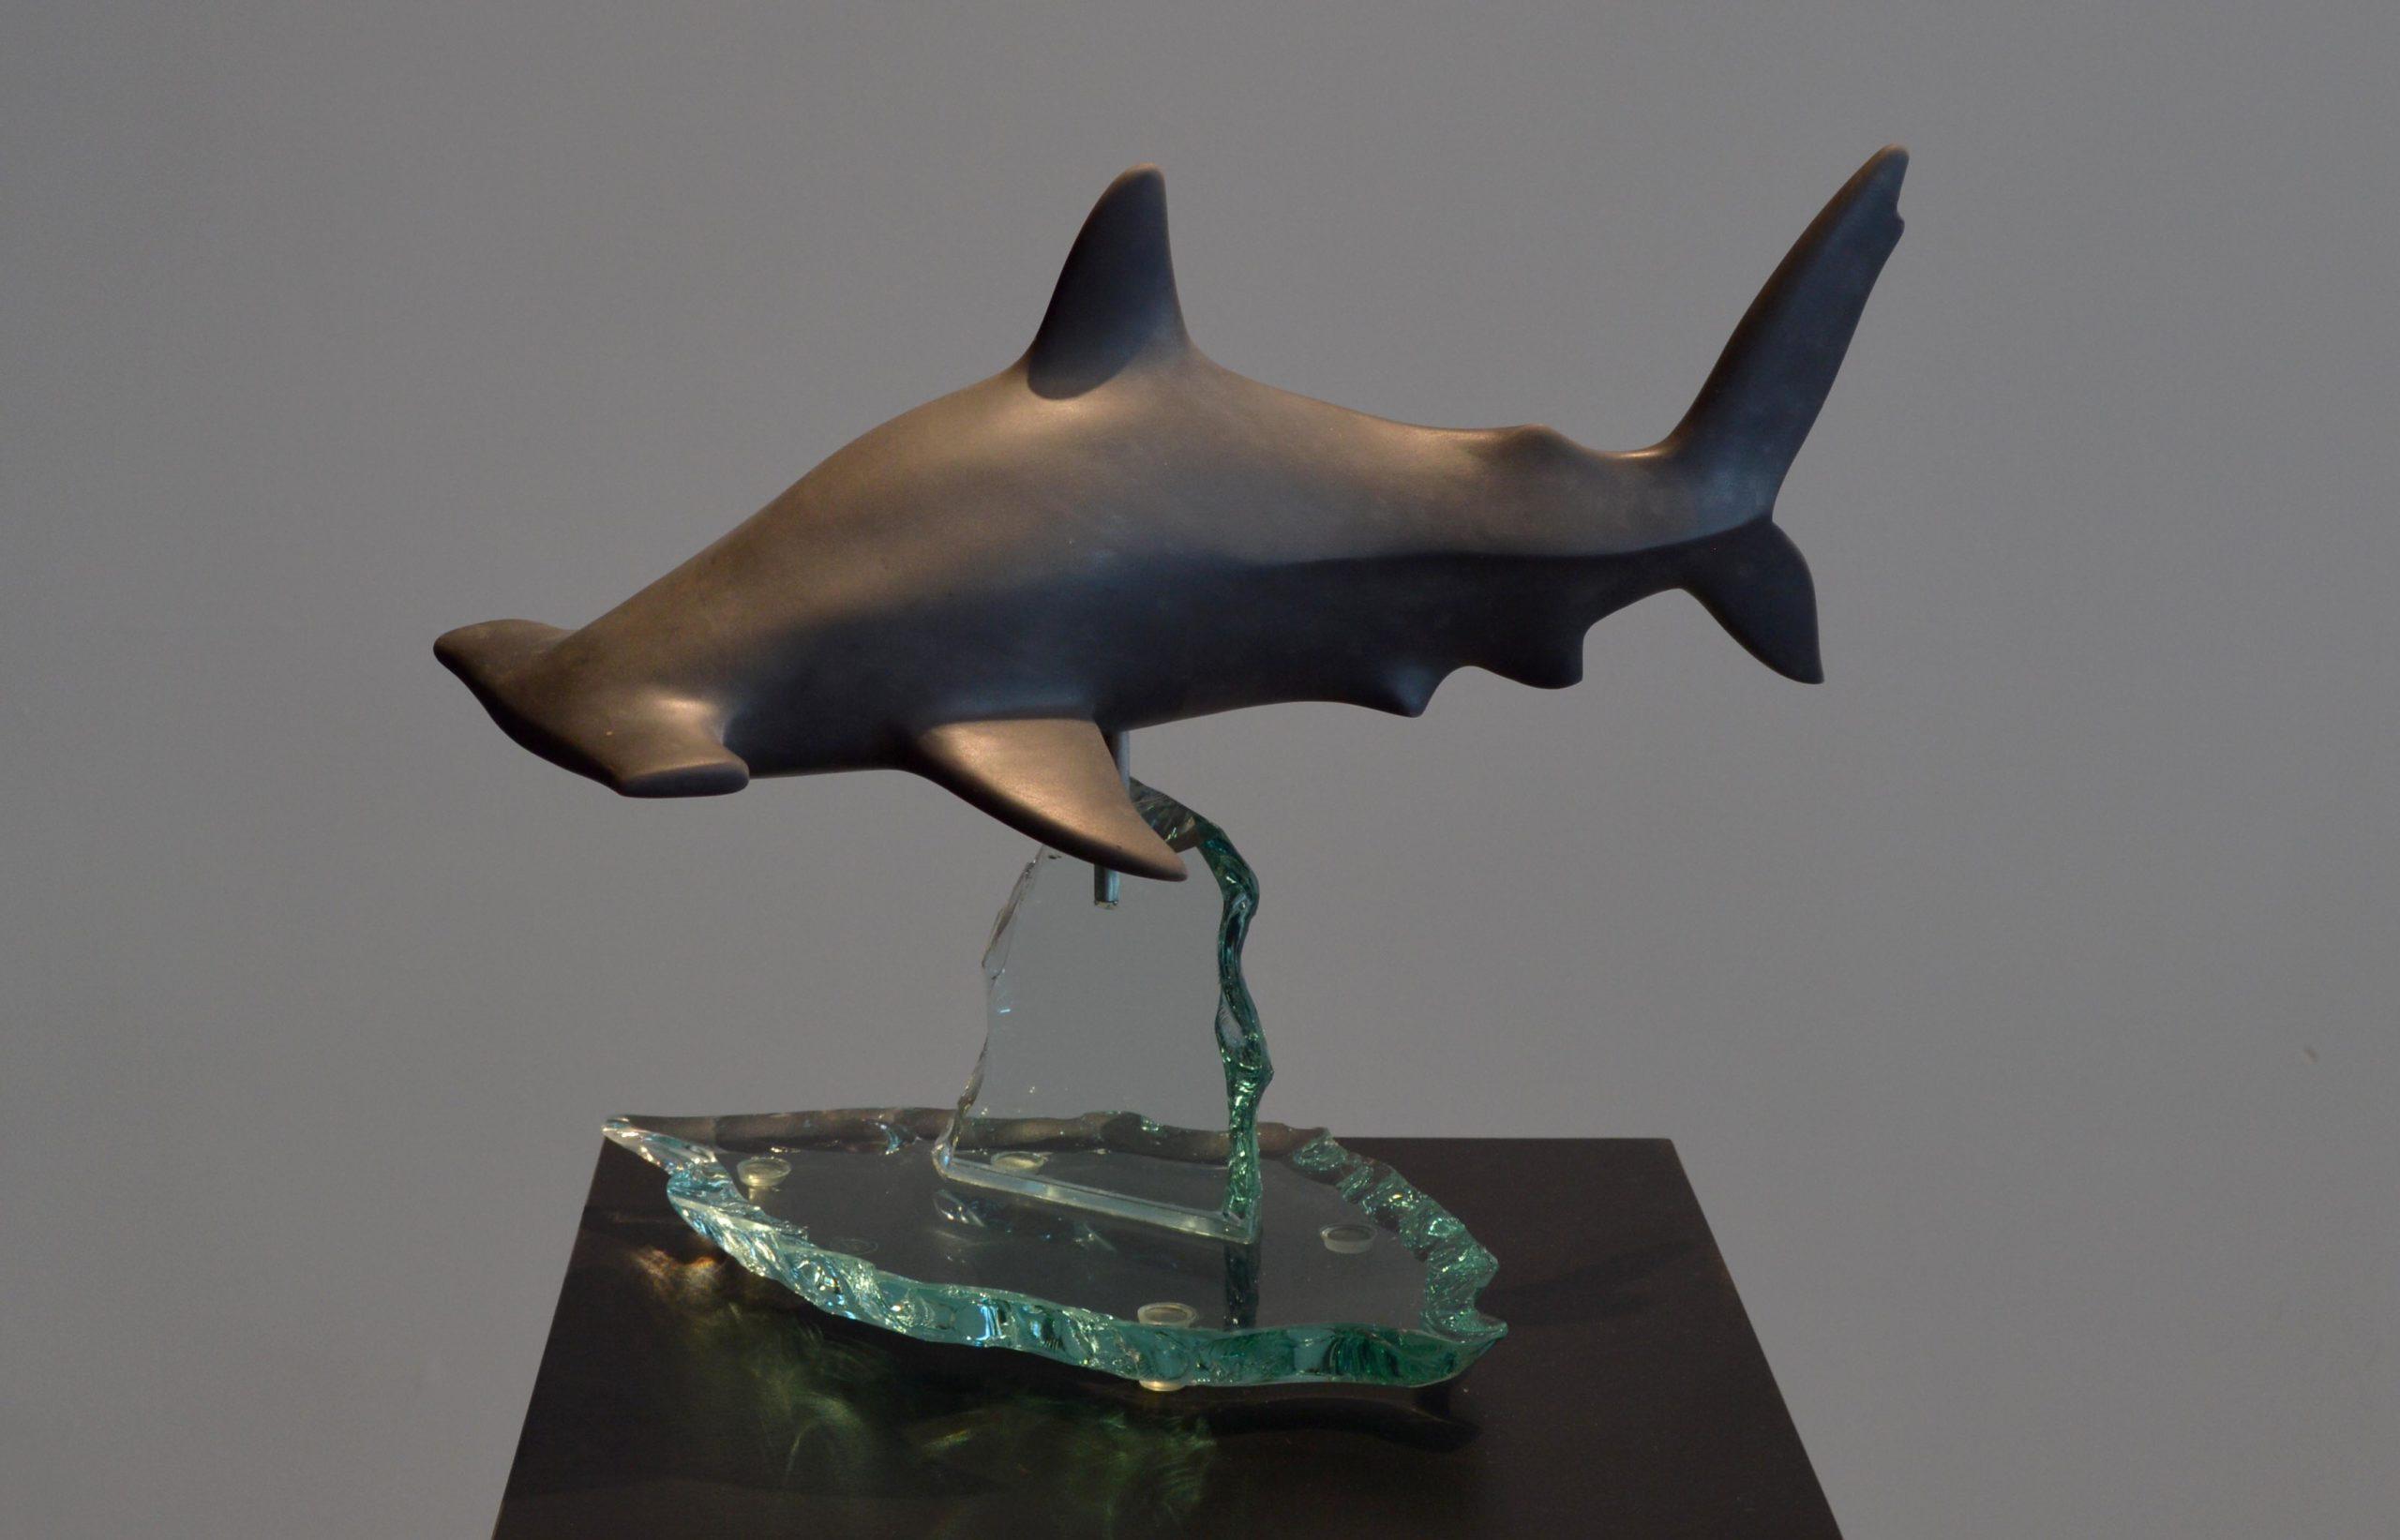 michael binkley sculptor stone sculpture hammerhead shark fine art carrara marble vancouver canada